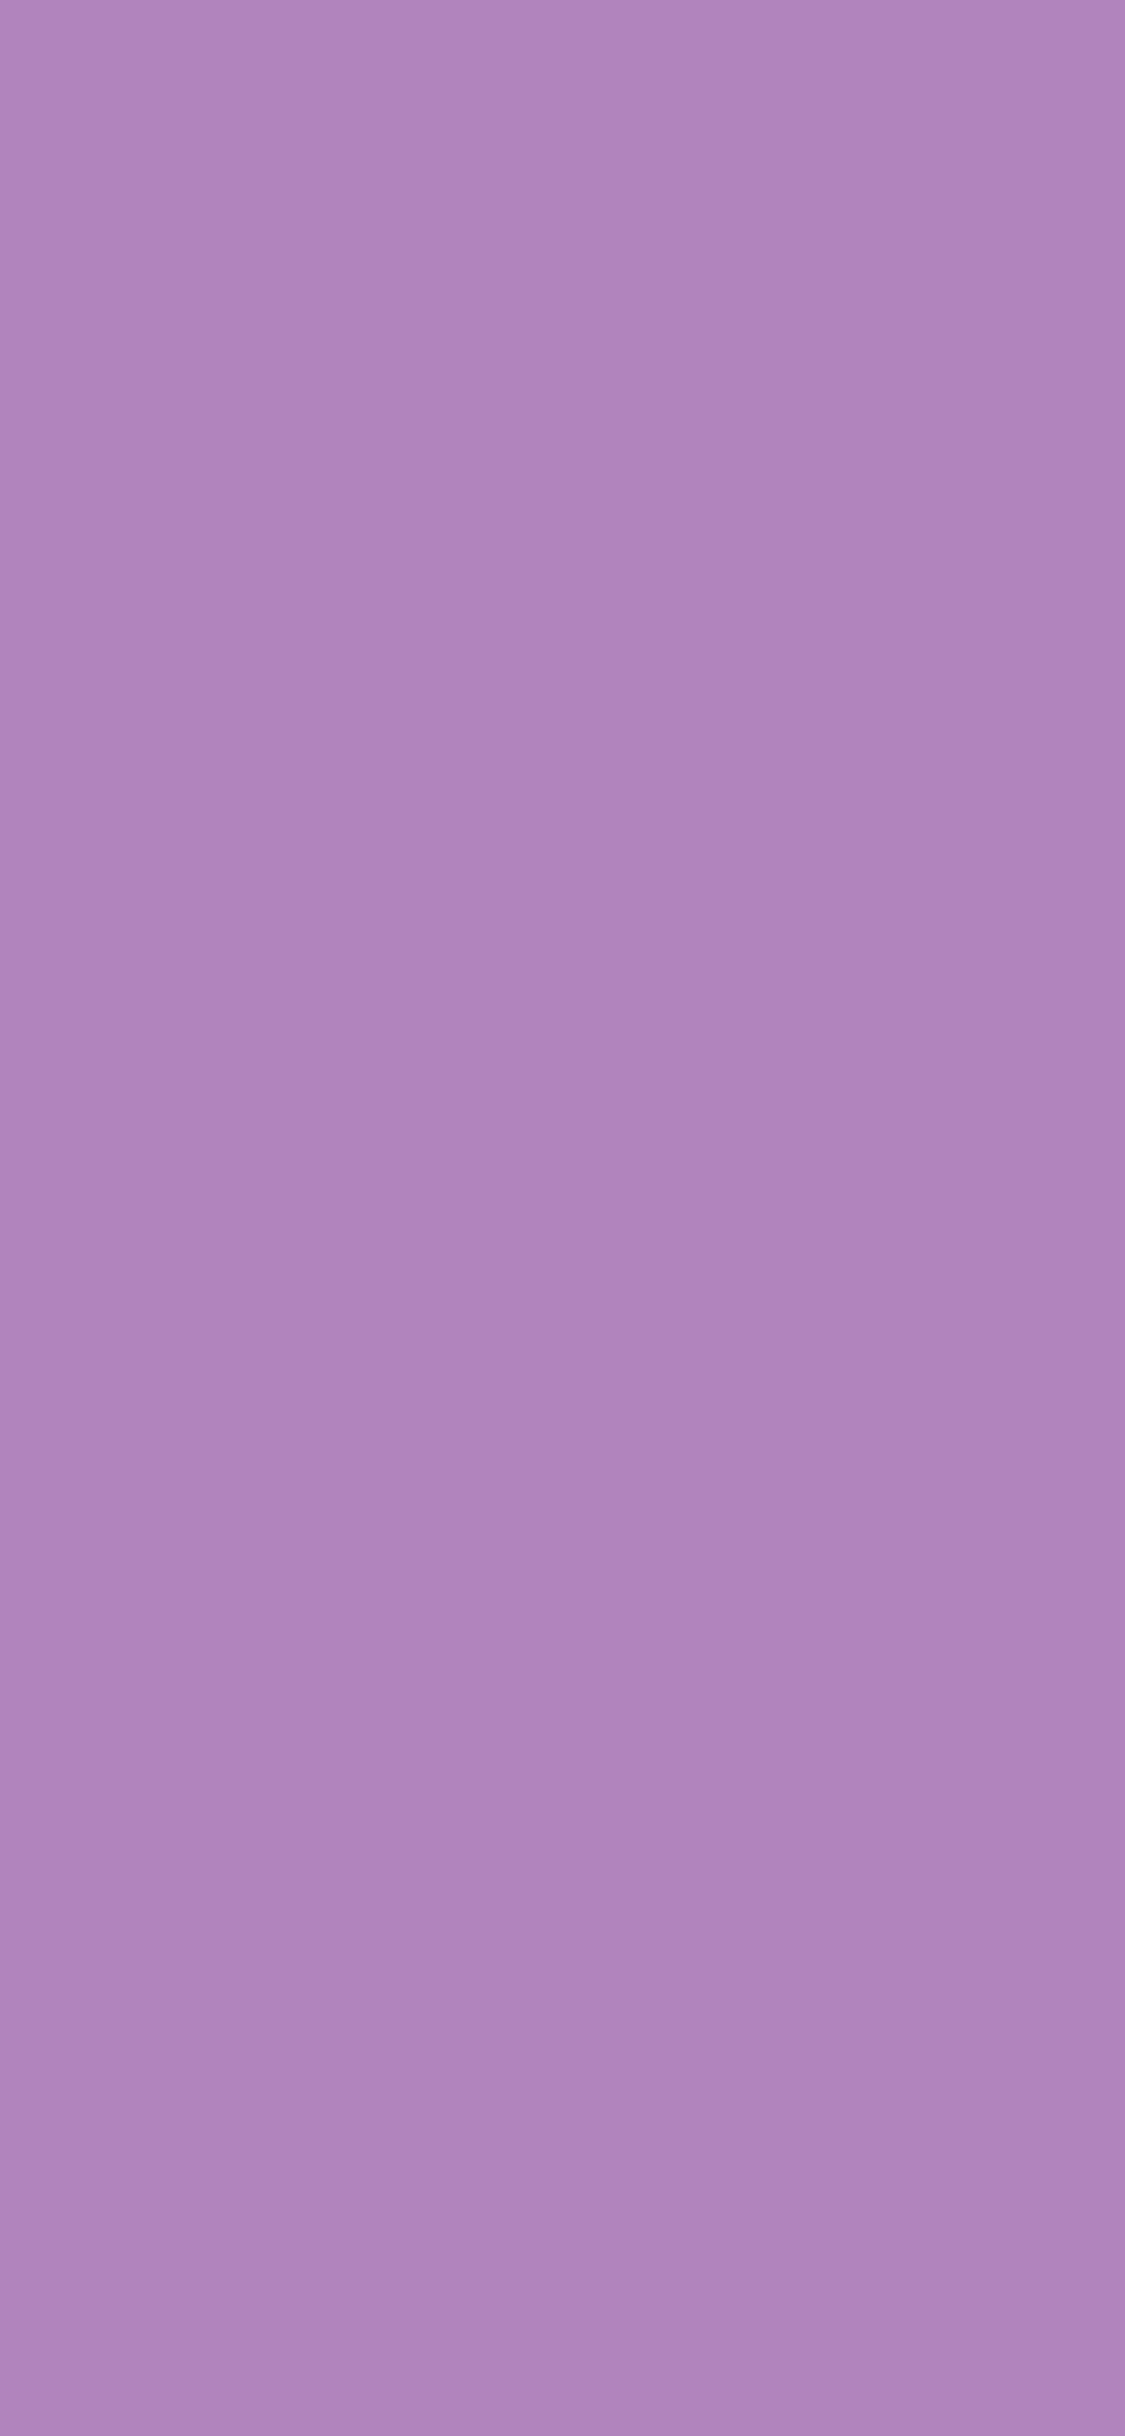 1125x2436 African Violet Solid Color Background